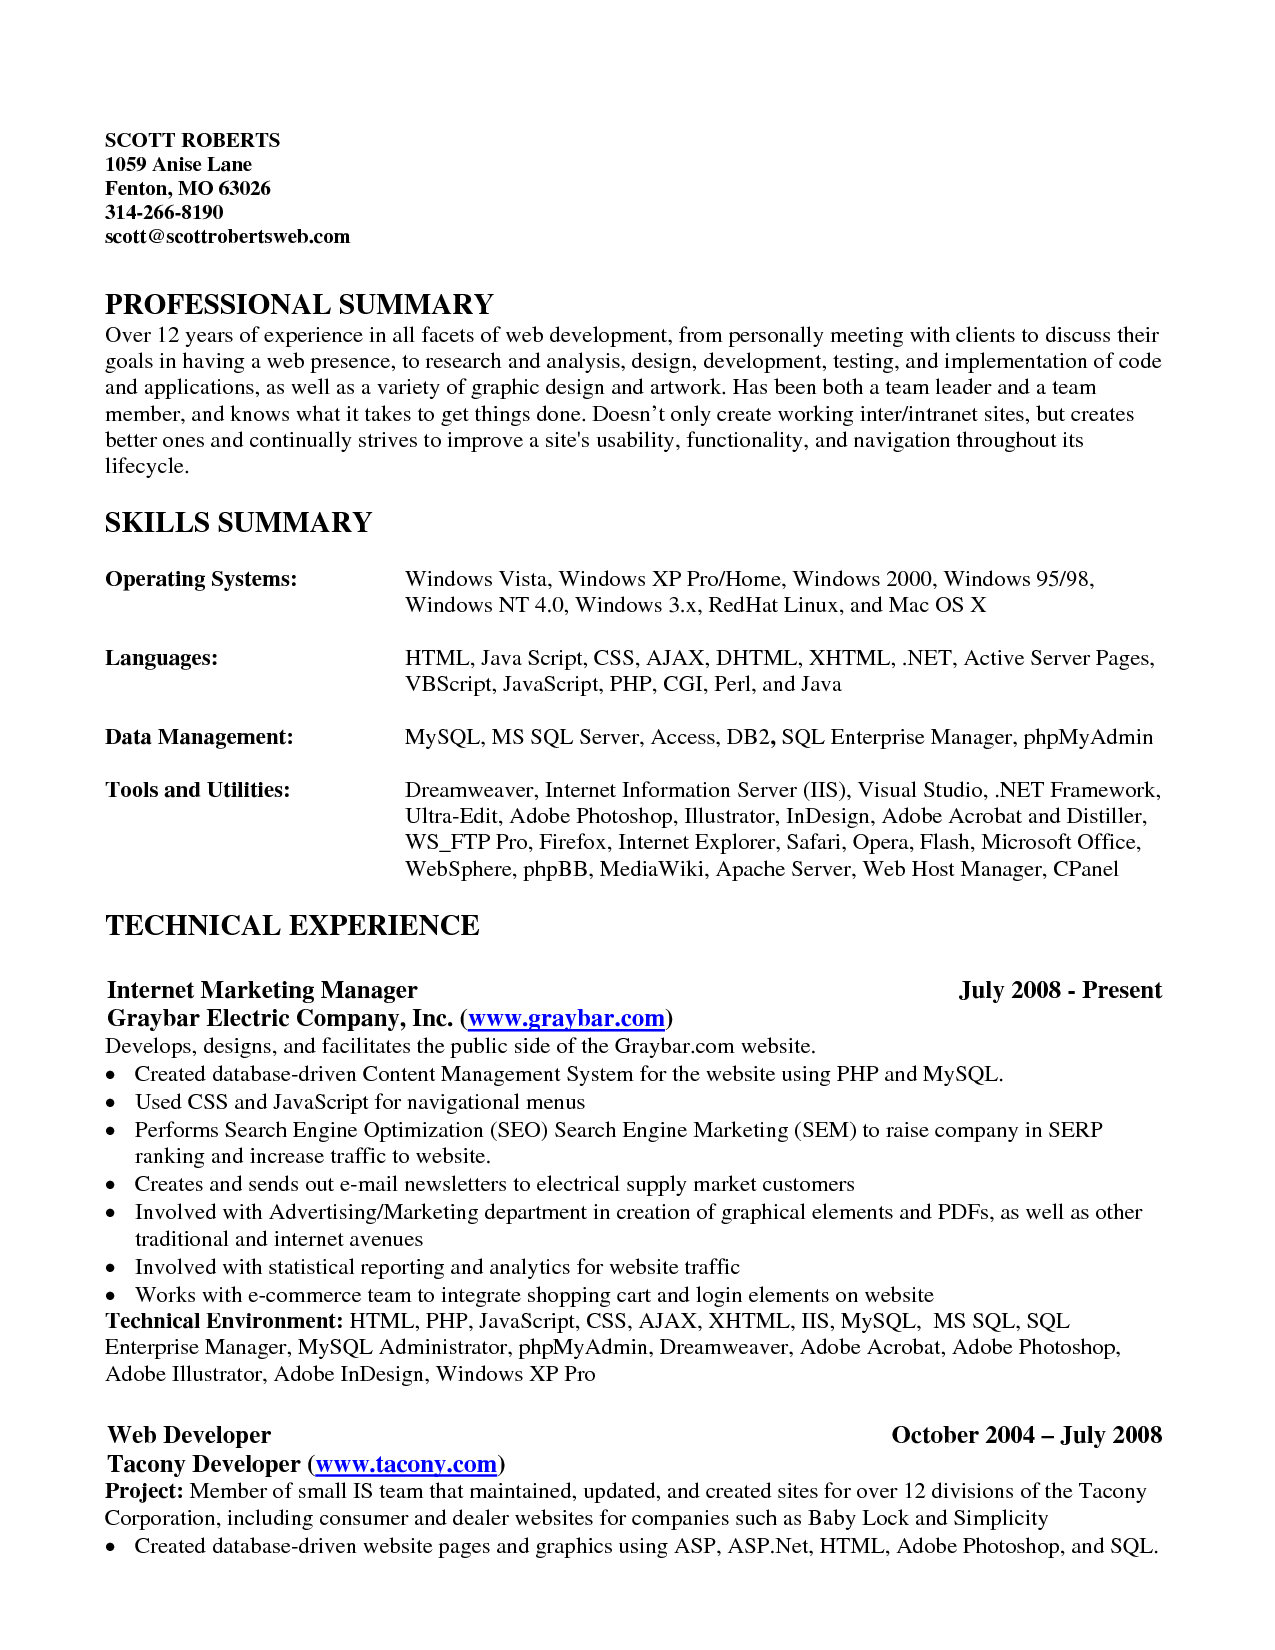 Example Of Skills Summary For Resume Resume Summary Objective Resume Summary Of Skills